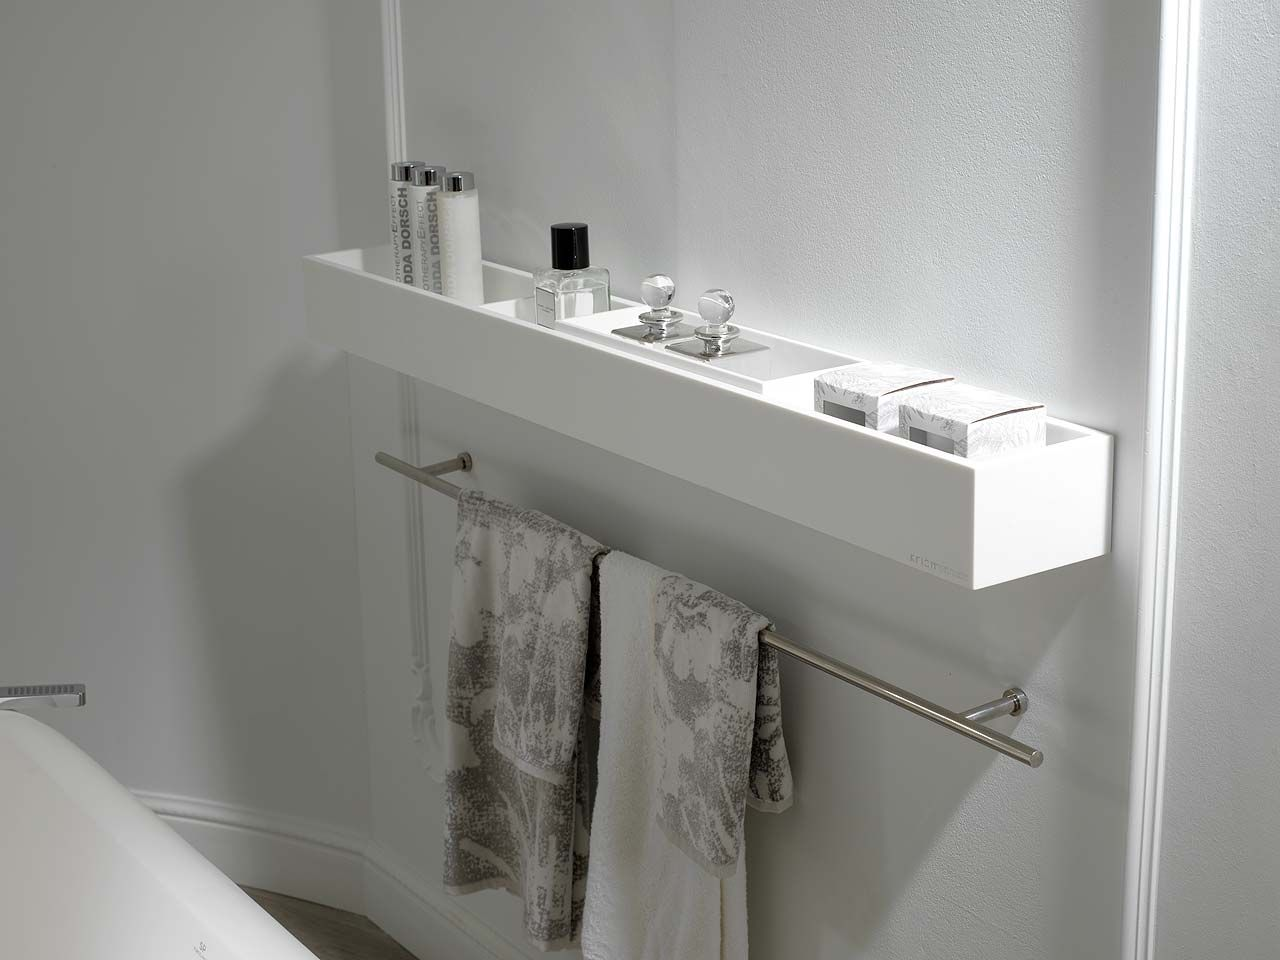 Accesorios de baño Modul · K | Plumbing - Bath Accessories ...